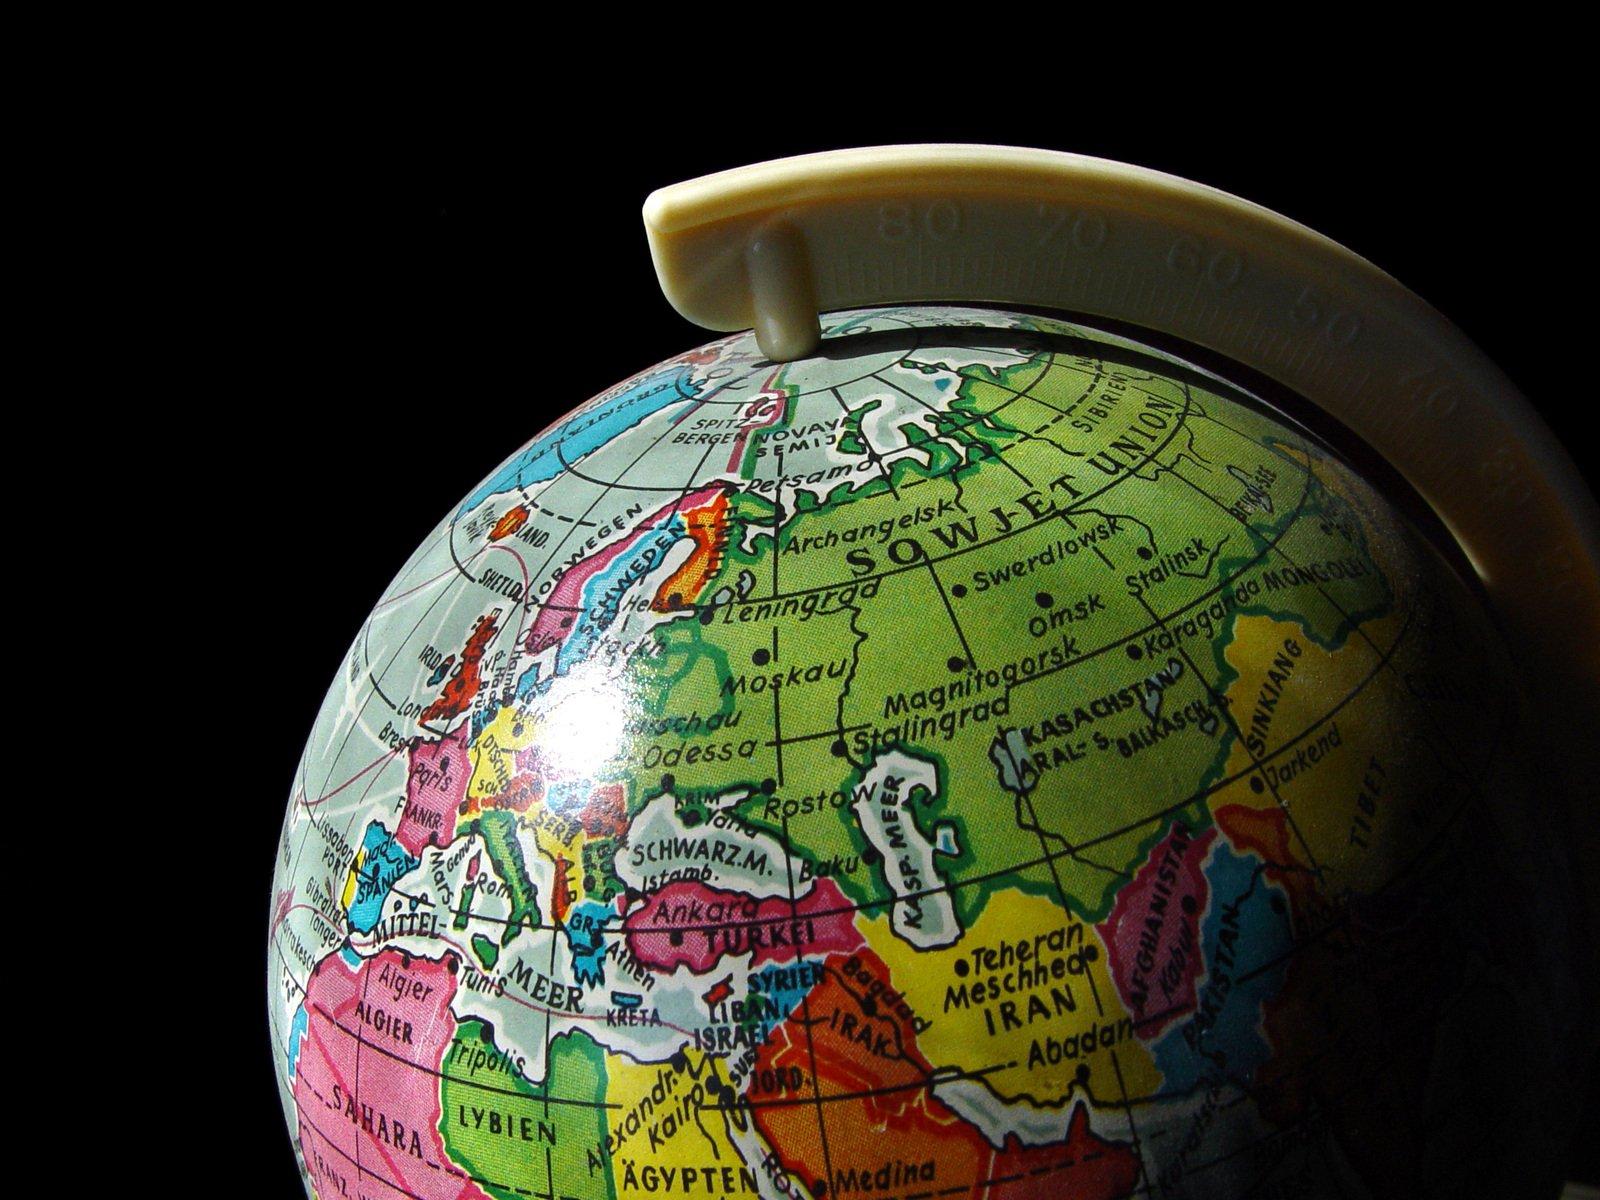 Europe-Asia in globe of Earth